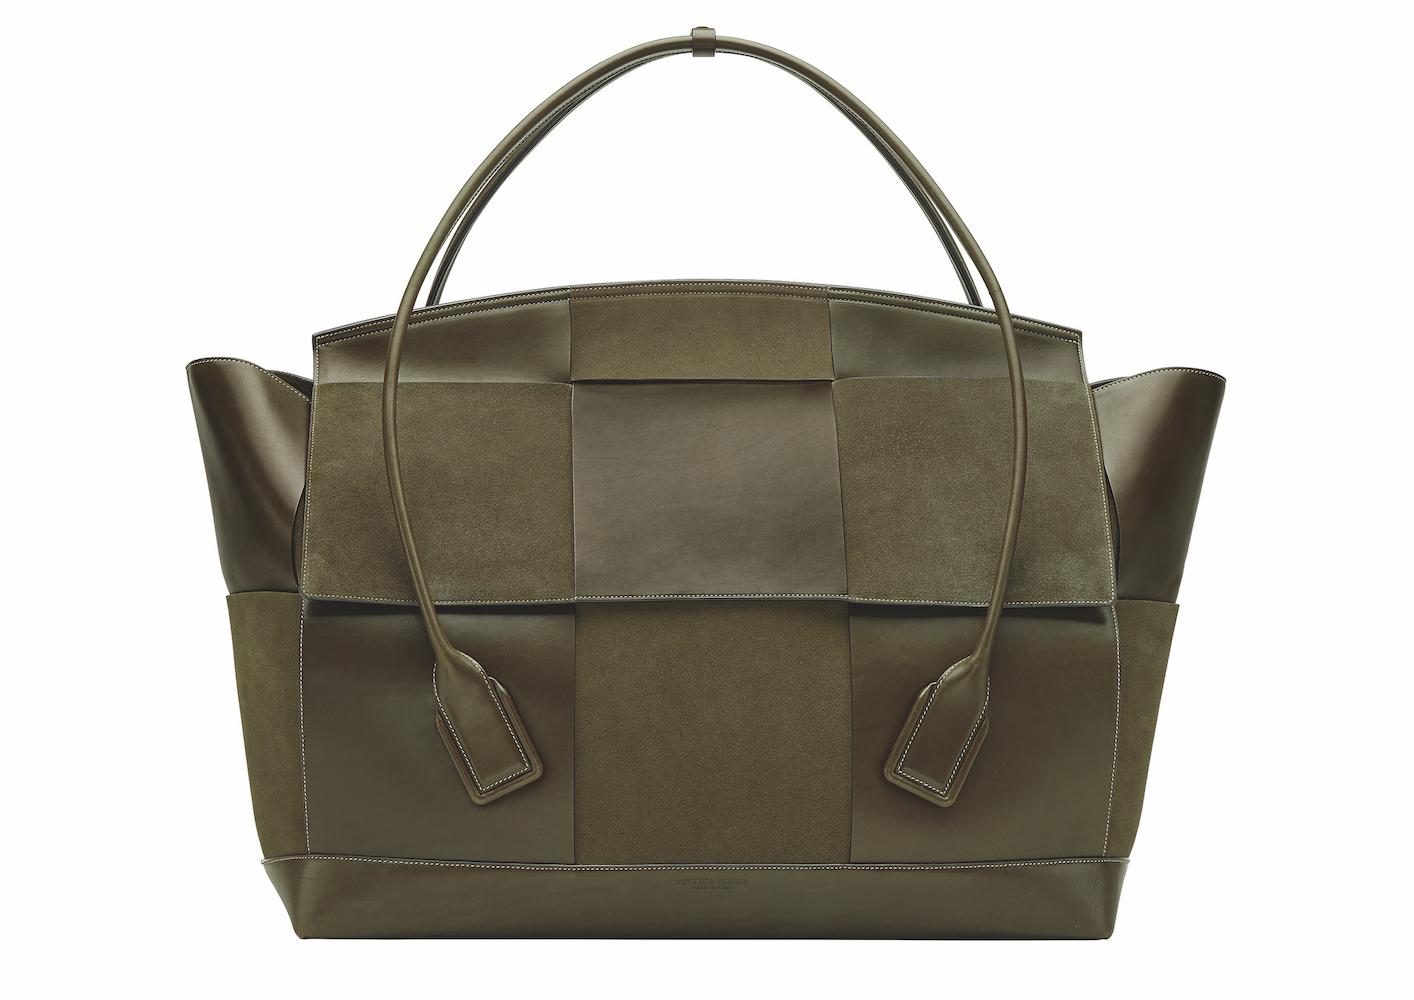 Bottega Veneta The Arco Bag (6).jpg